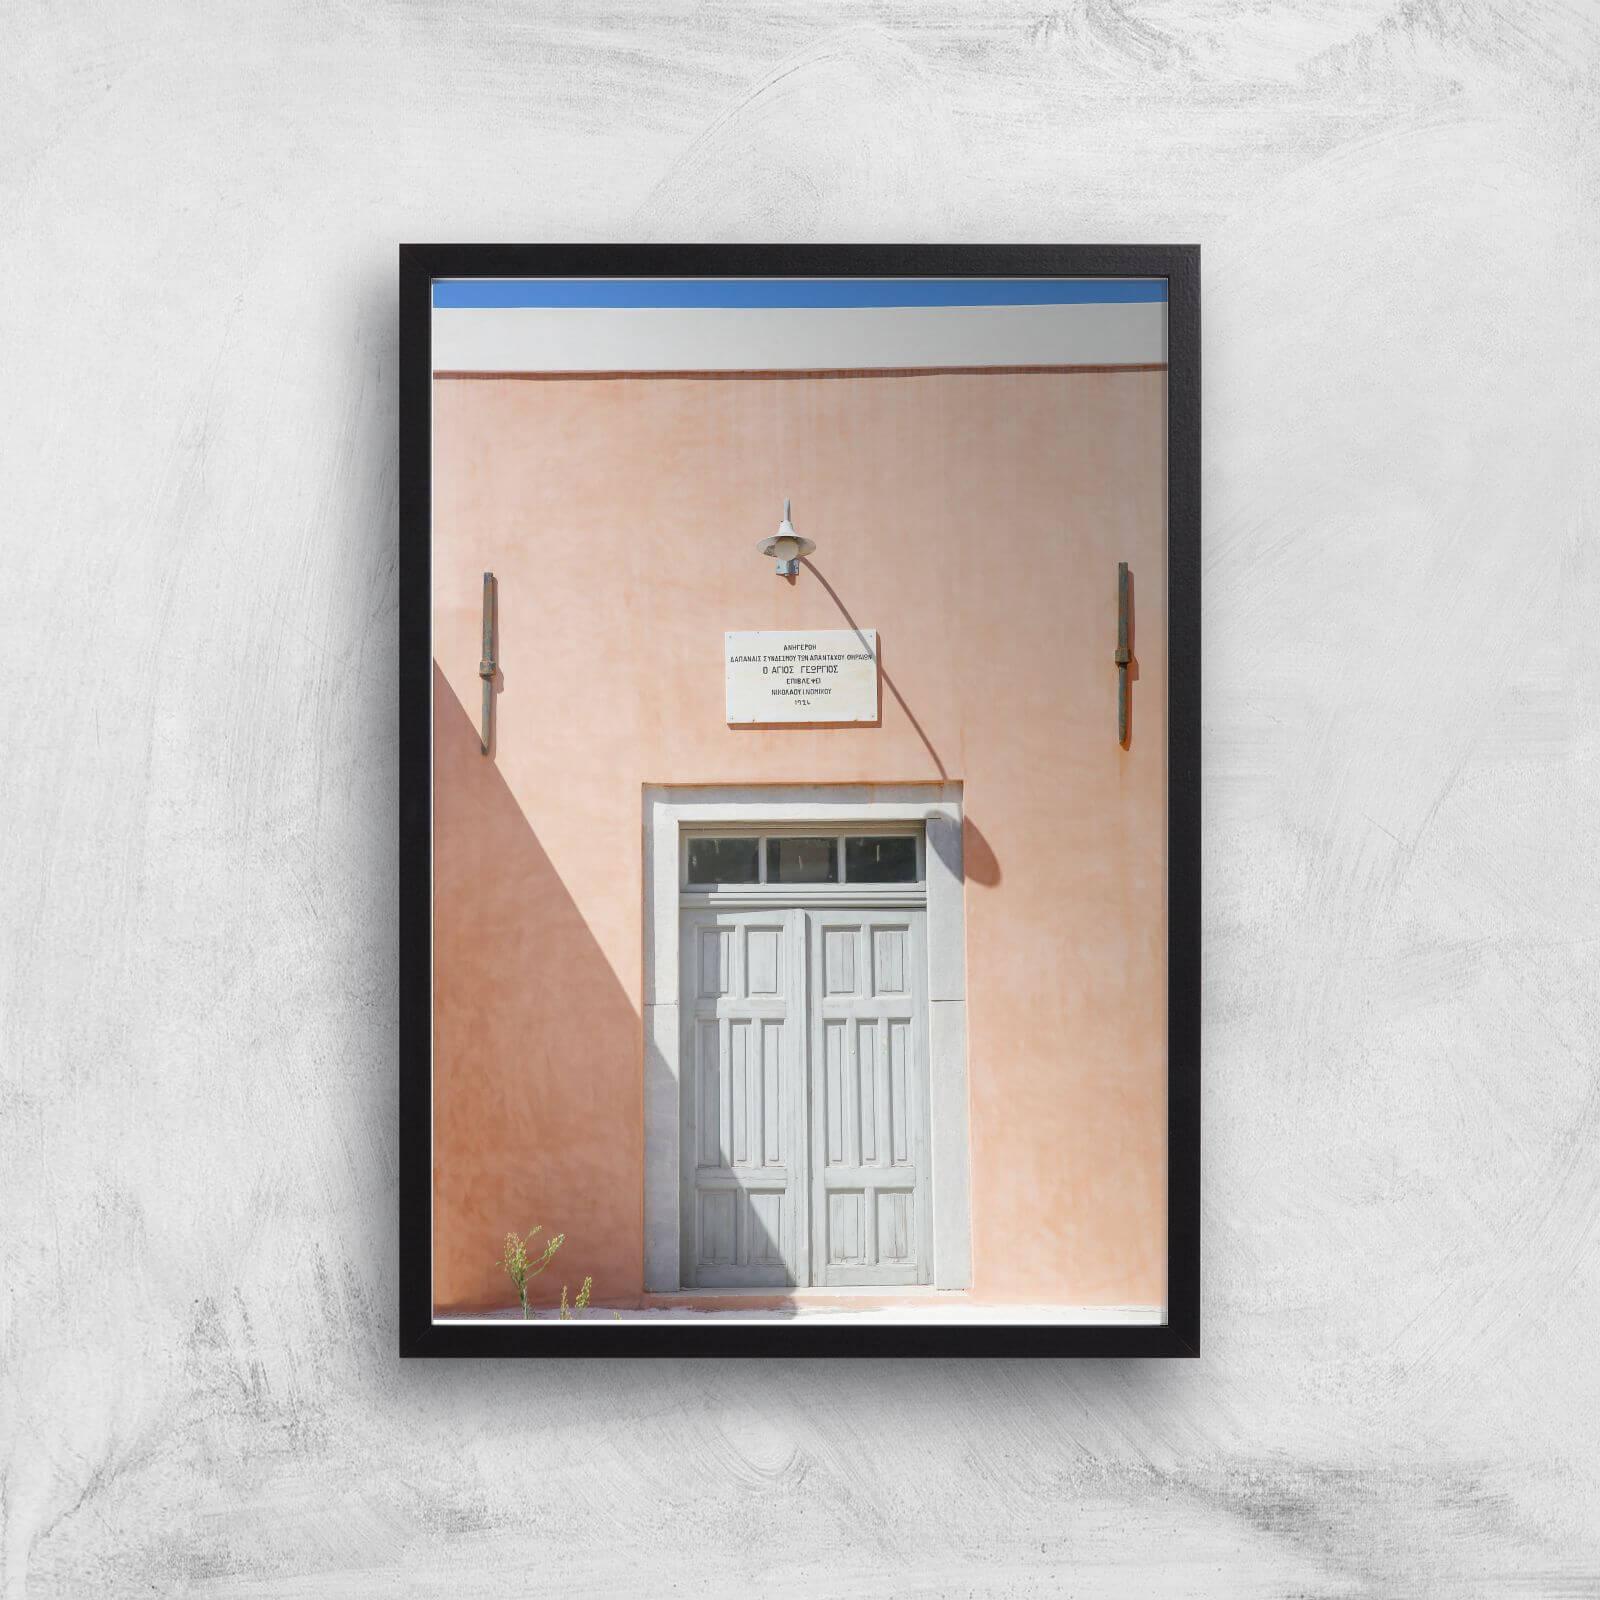 santorini secrets giclee art print - a3 - black frame